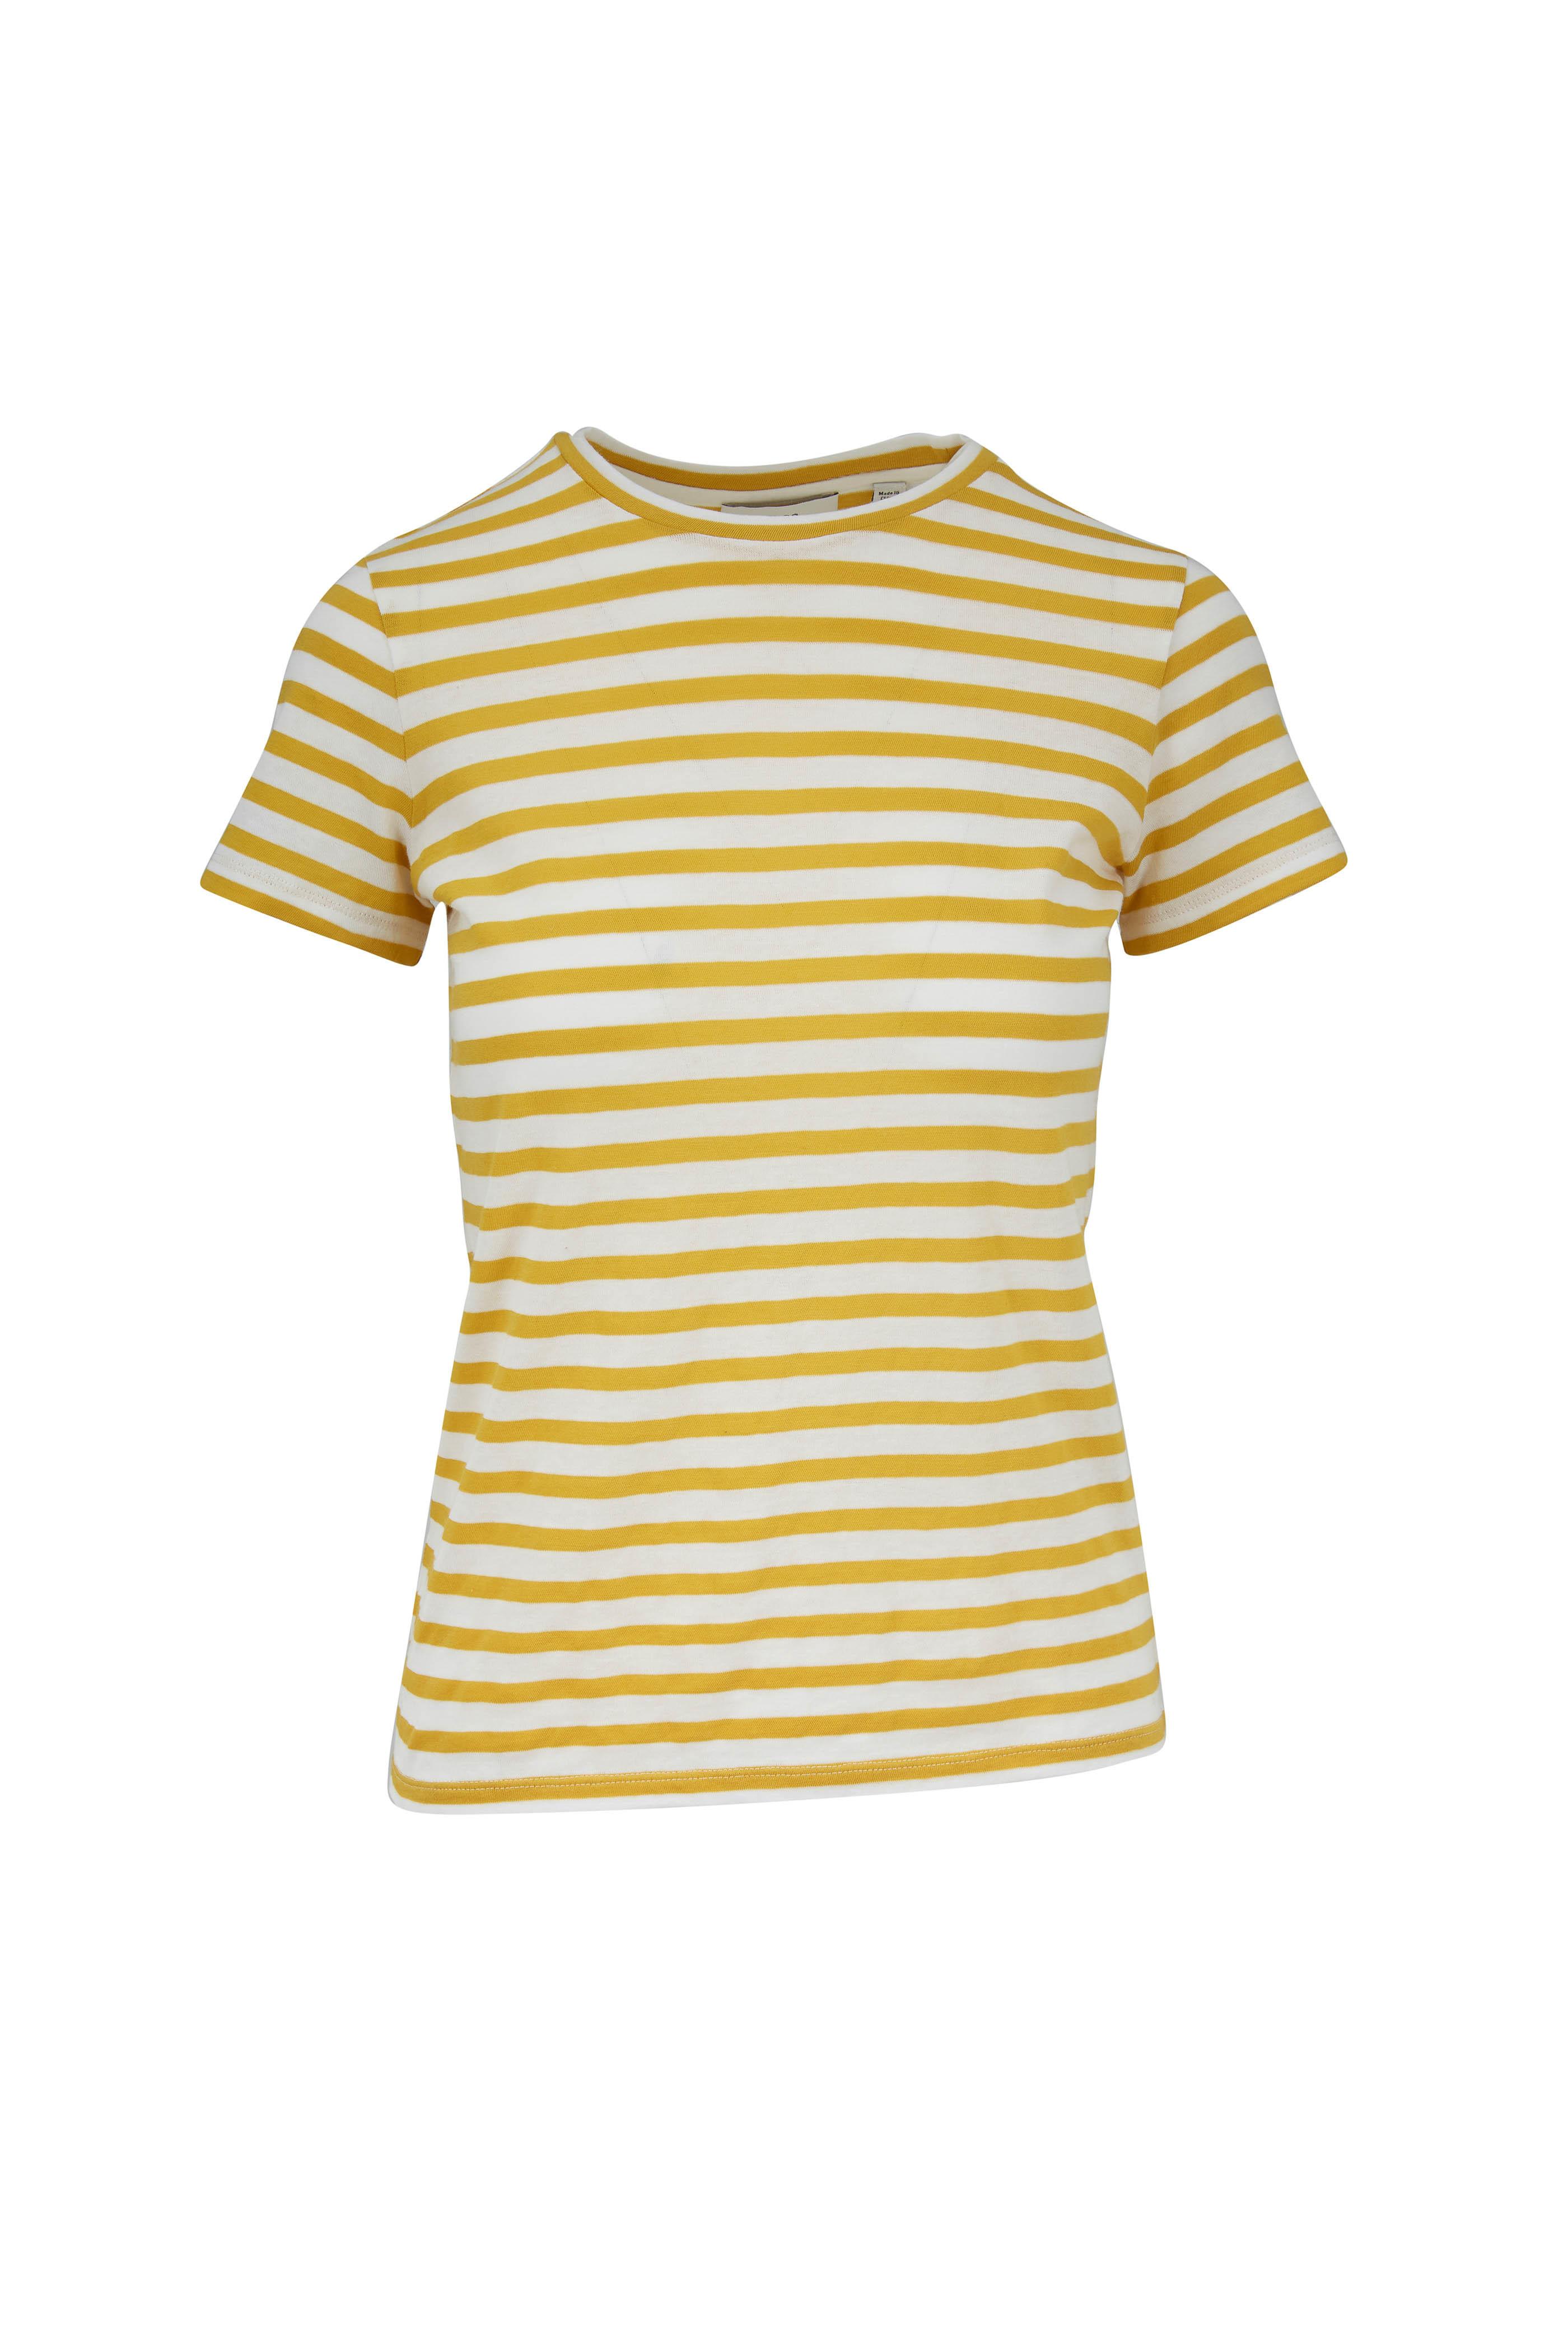 9f4b31bd5c Vince - Limonata Bengal Striped Cotton T-Shirt   Mitchell Stores